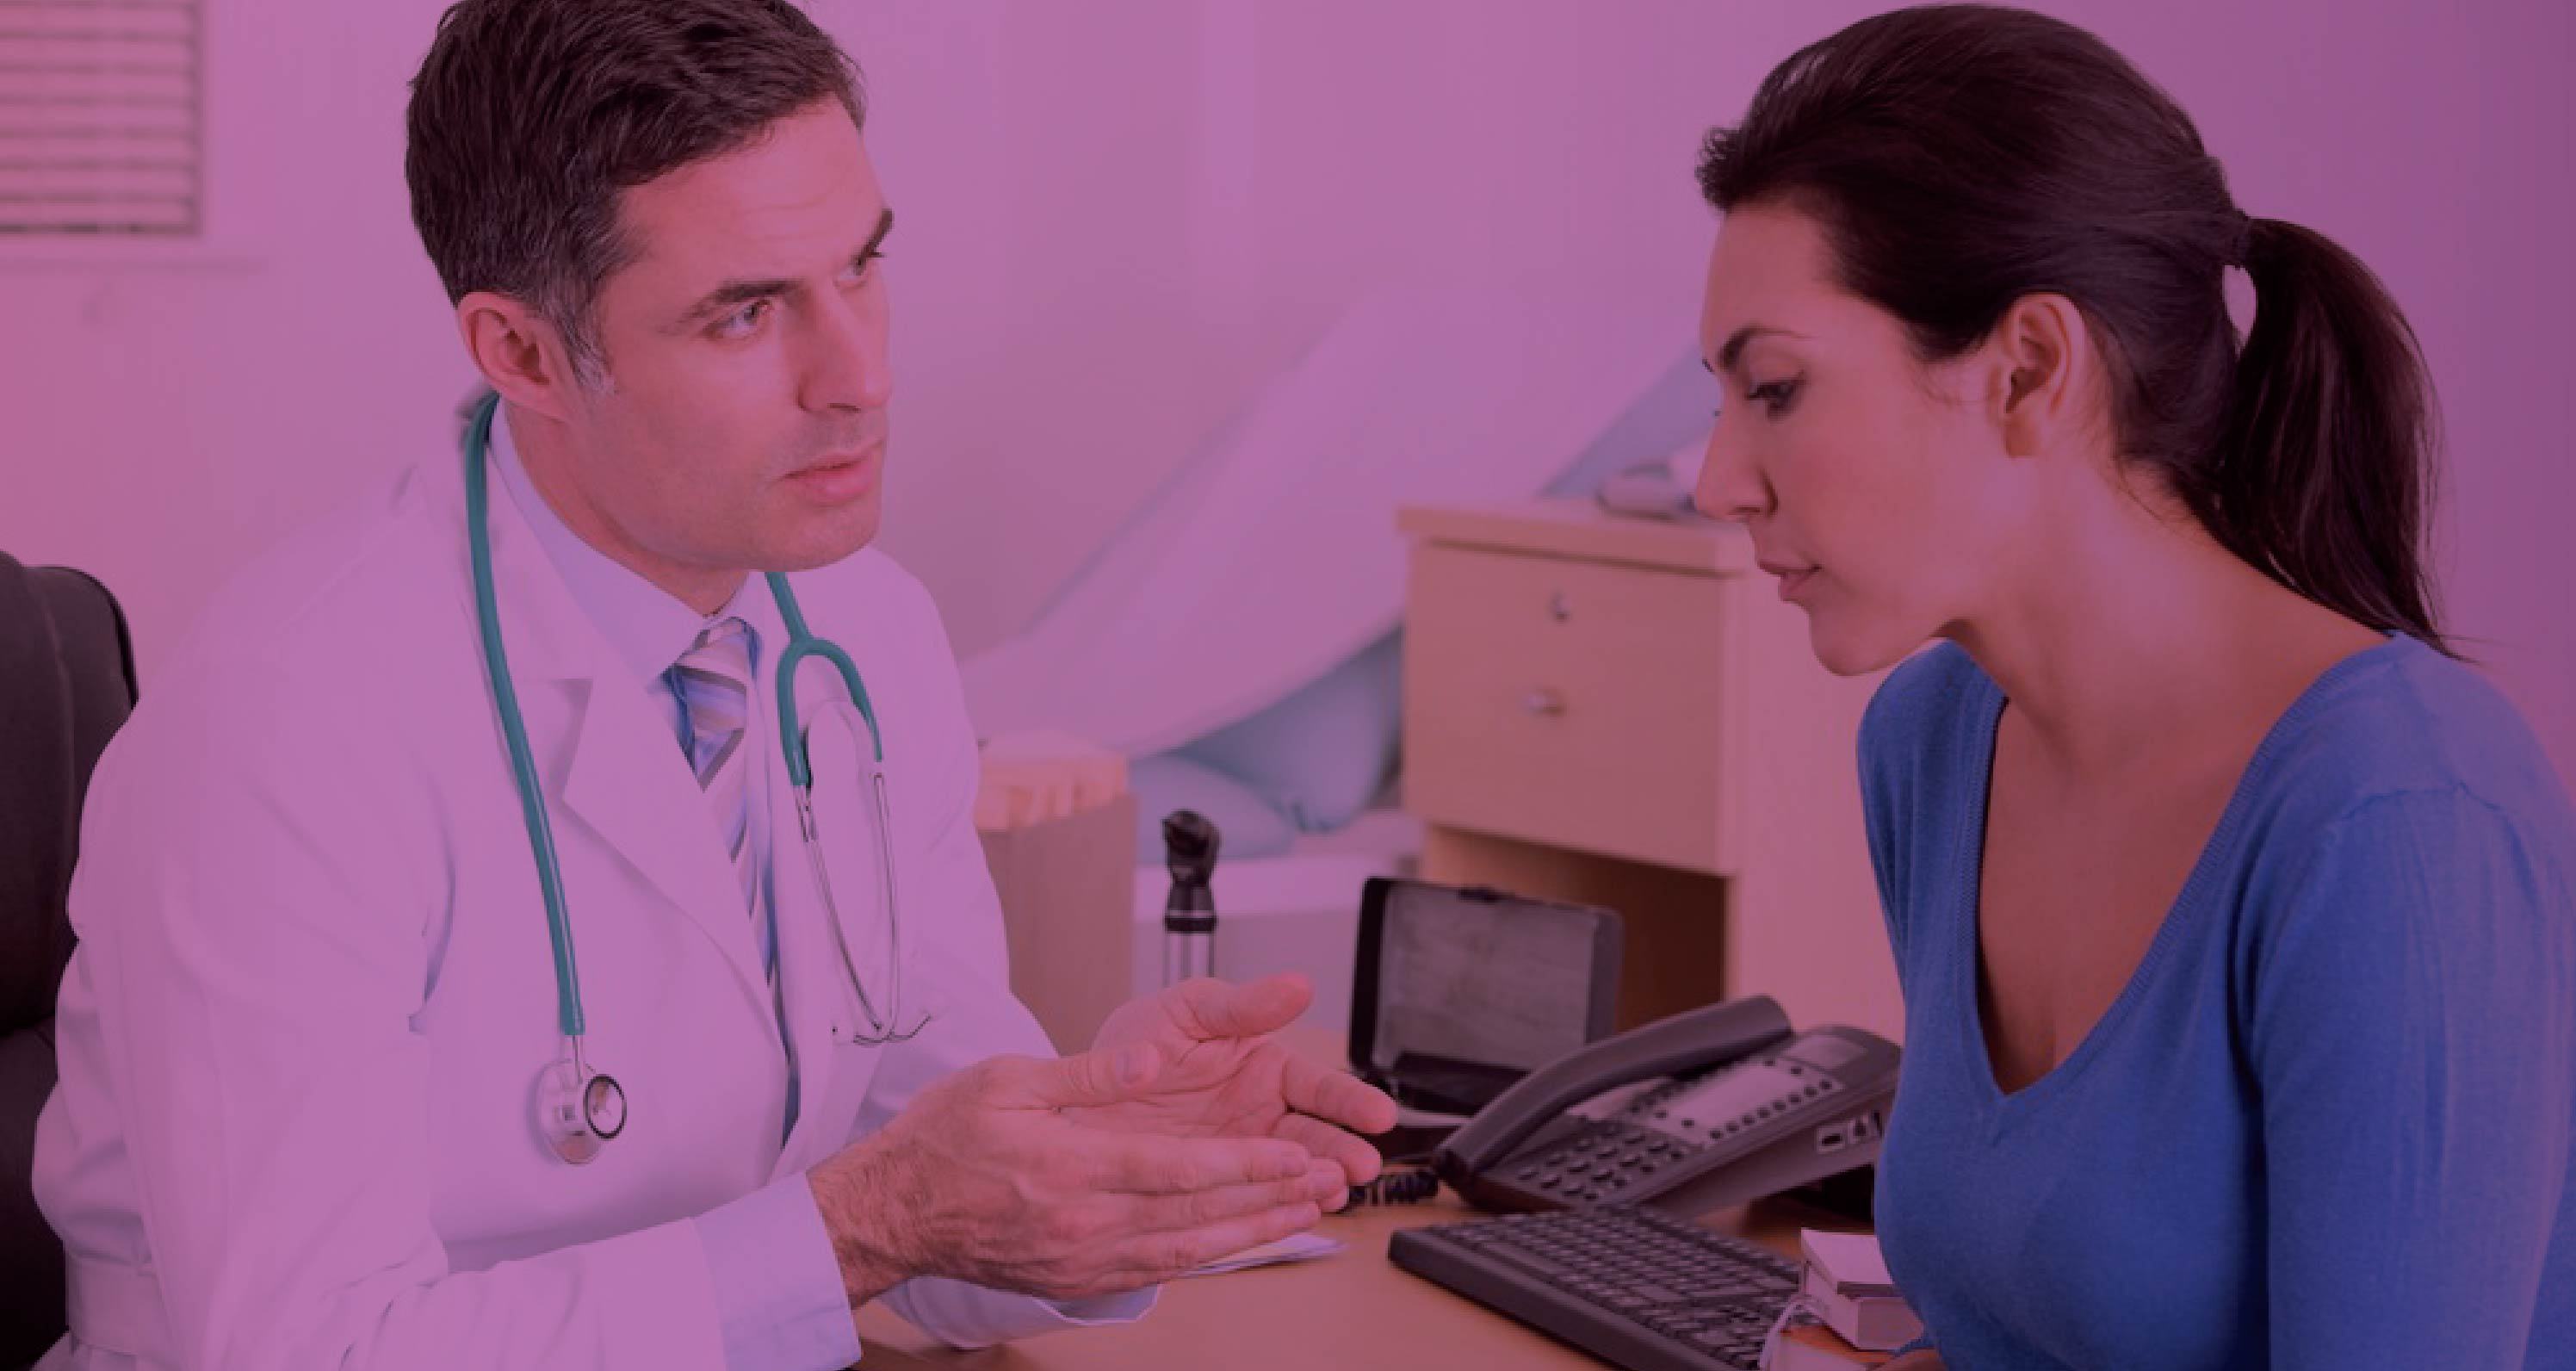 The Patient Voice: The Patient-Provider Disconnect